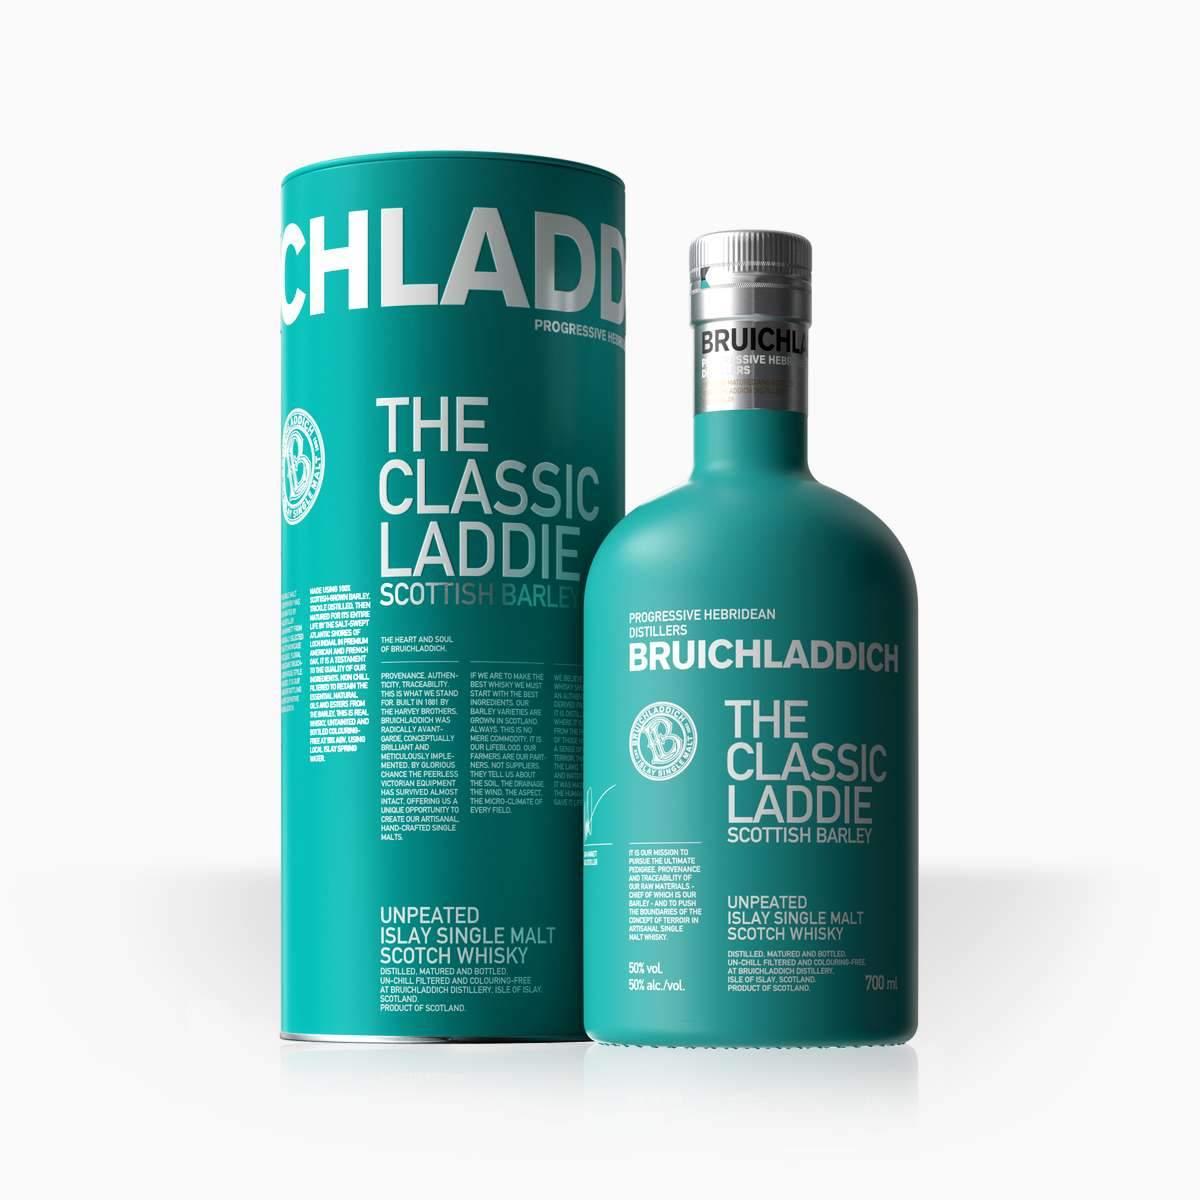 Whisky Bruichladdich The Classic Laddie 50% 0,7l